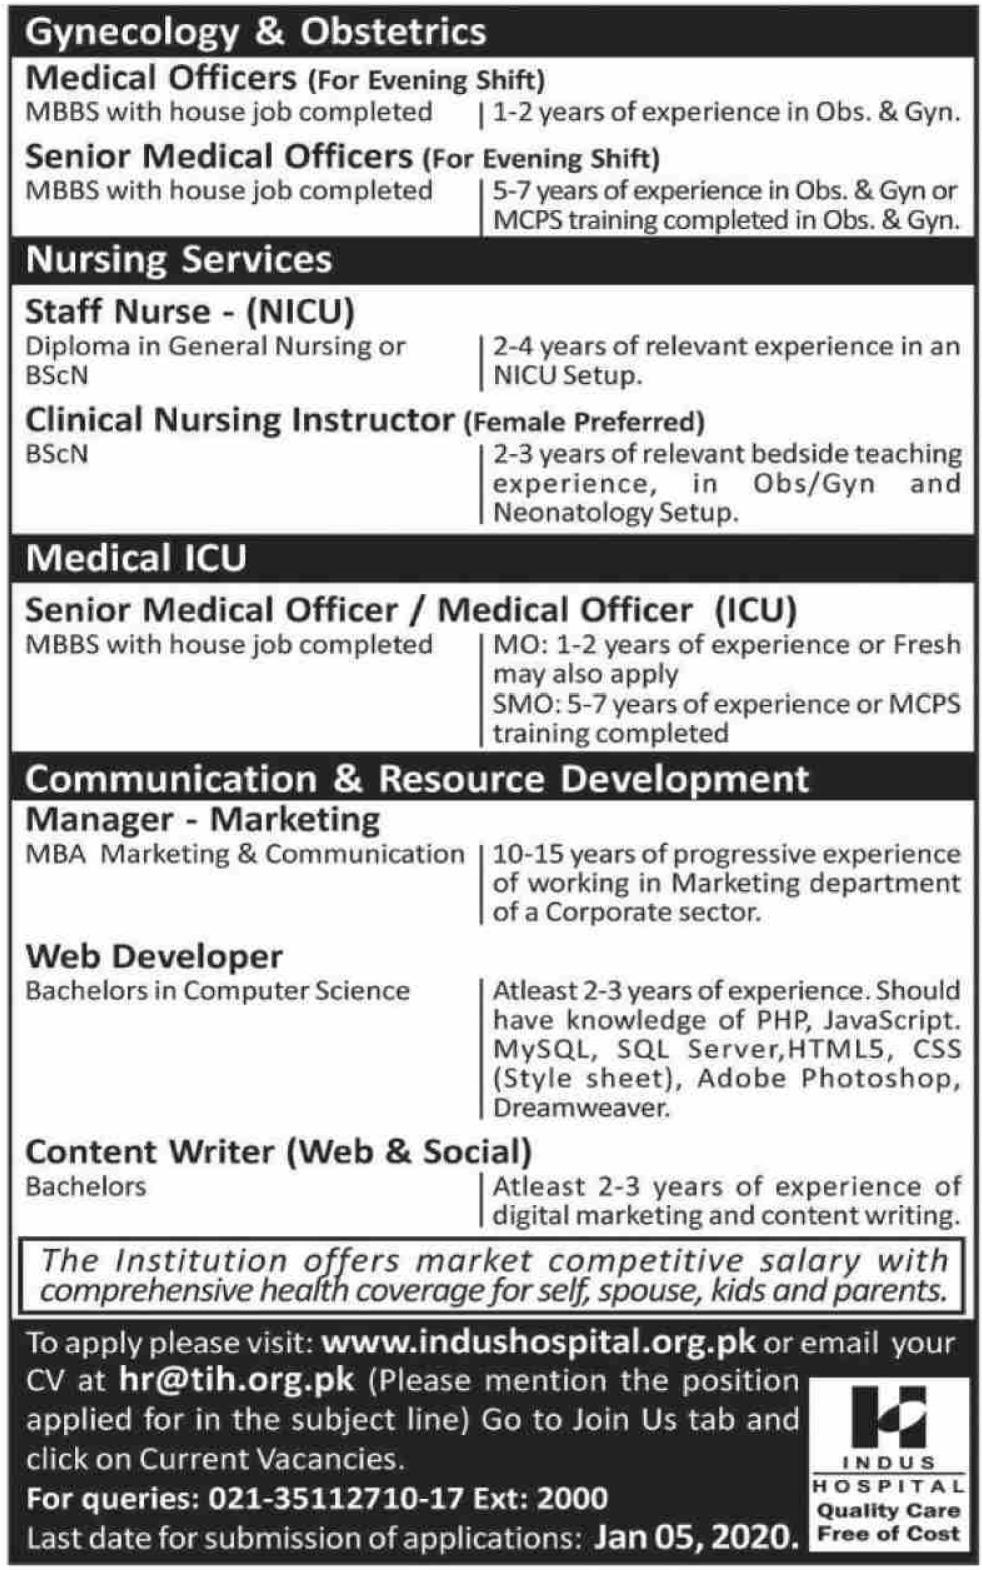 Indus Hospital Karachi Jobs 2019 Latest